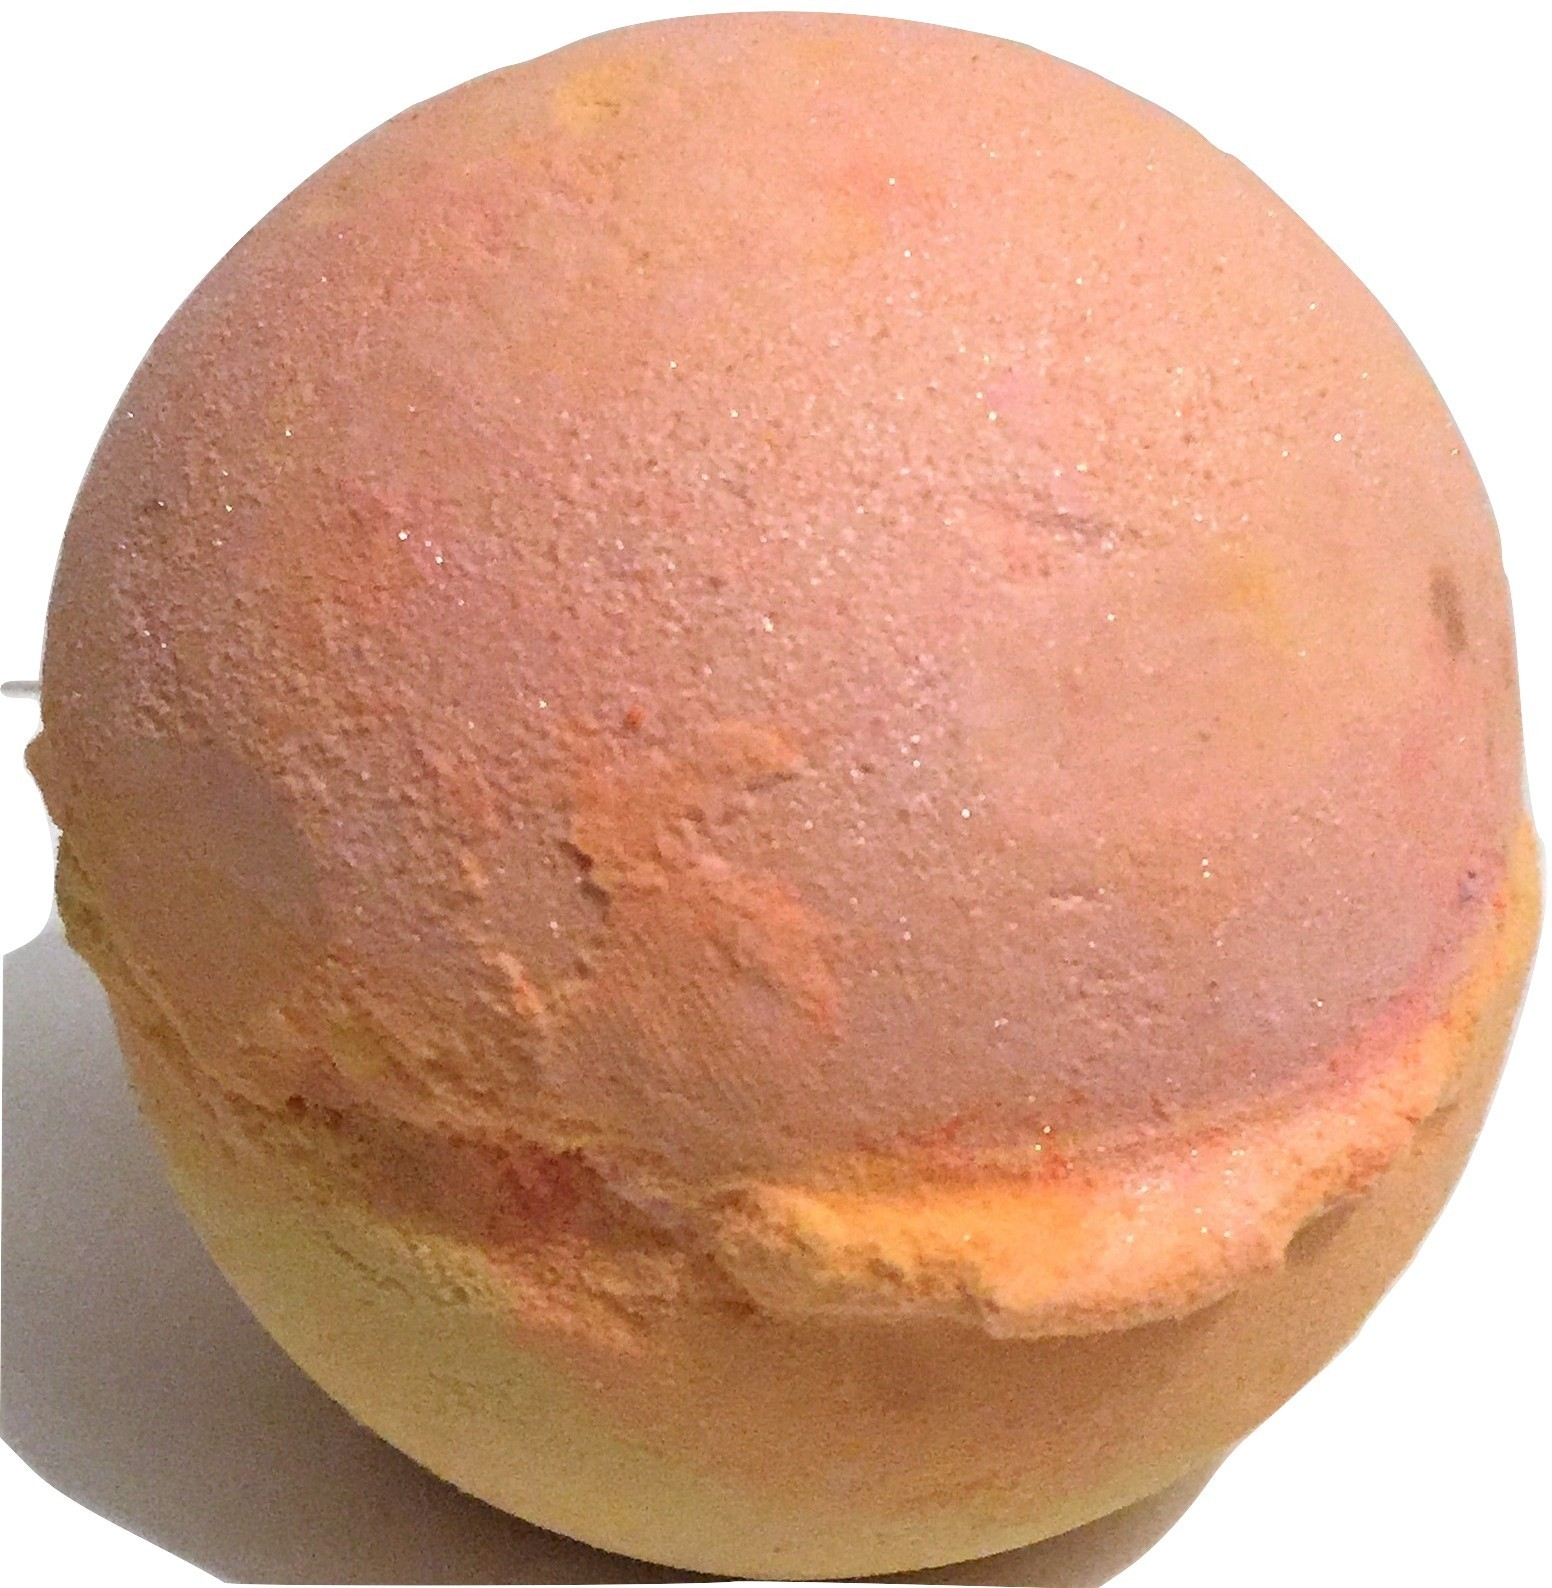 Lush Never Mind The ballistics Bath Bomb Vegan  - $34.99